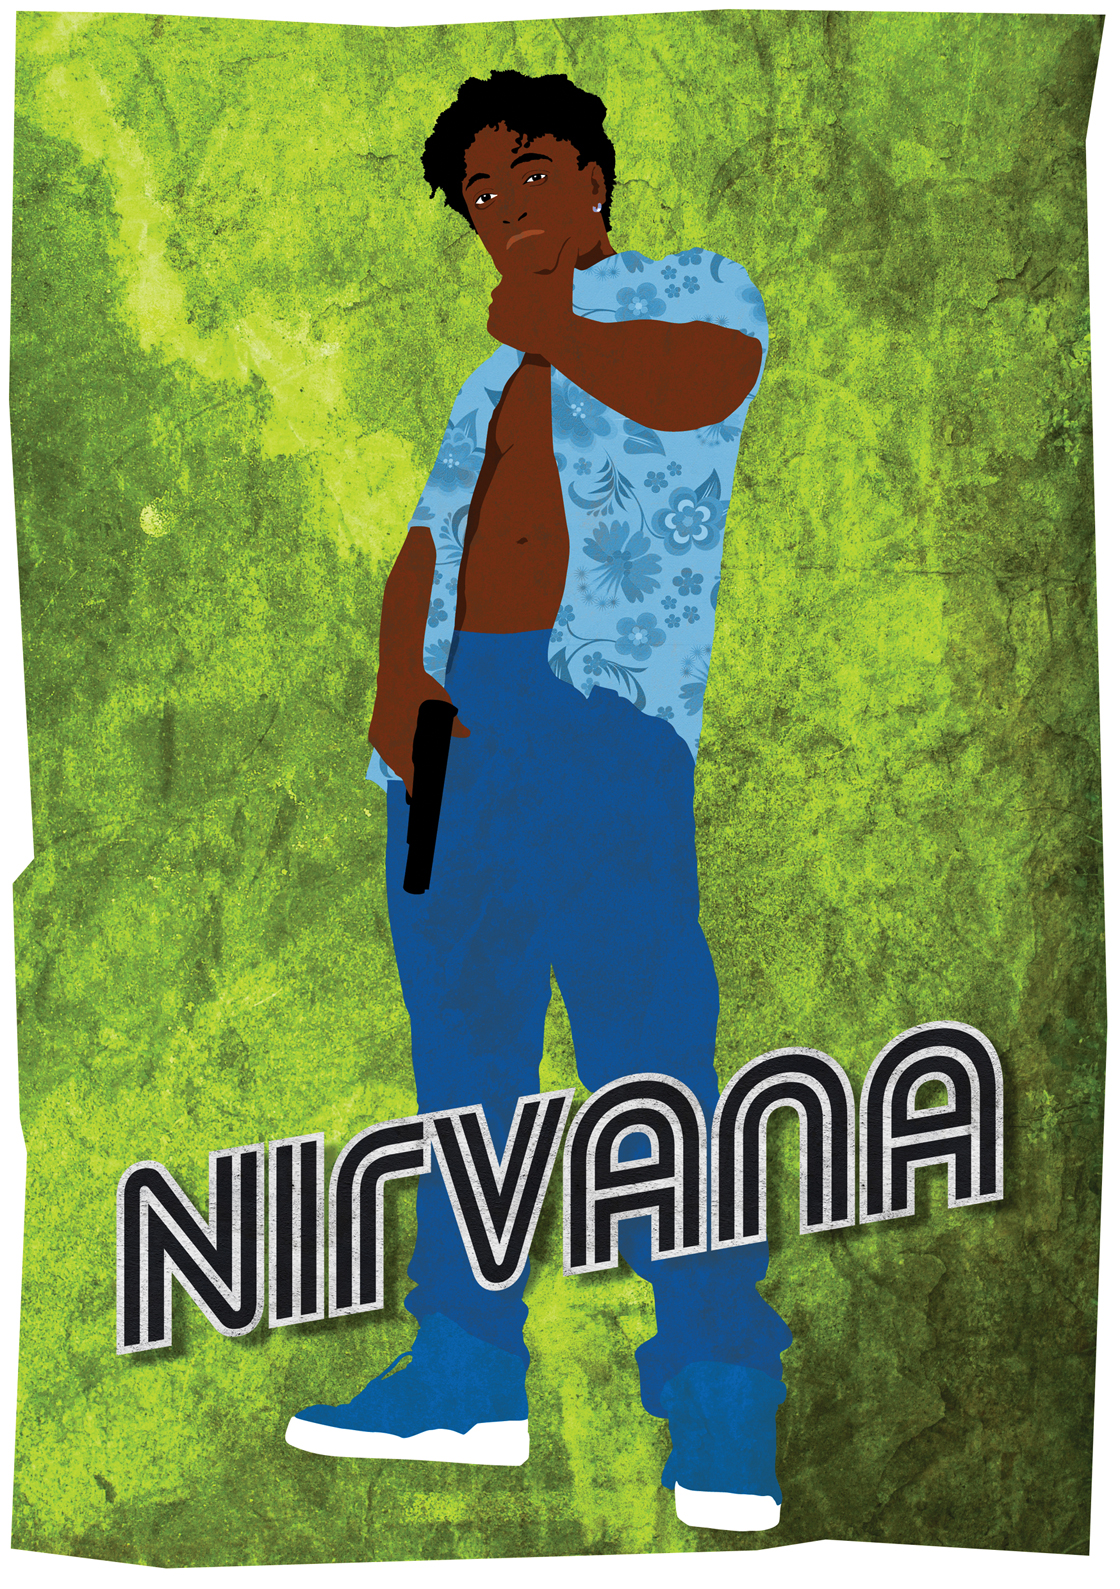 PRINT01_Nirvana14